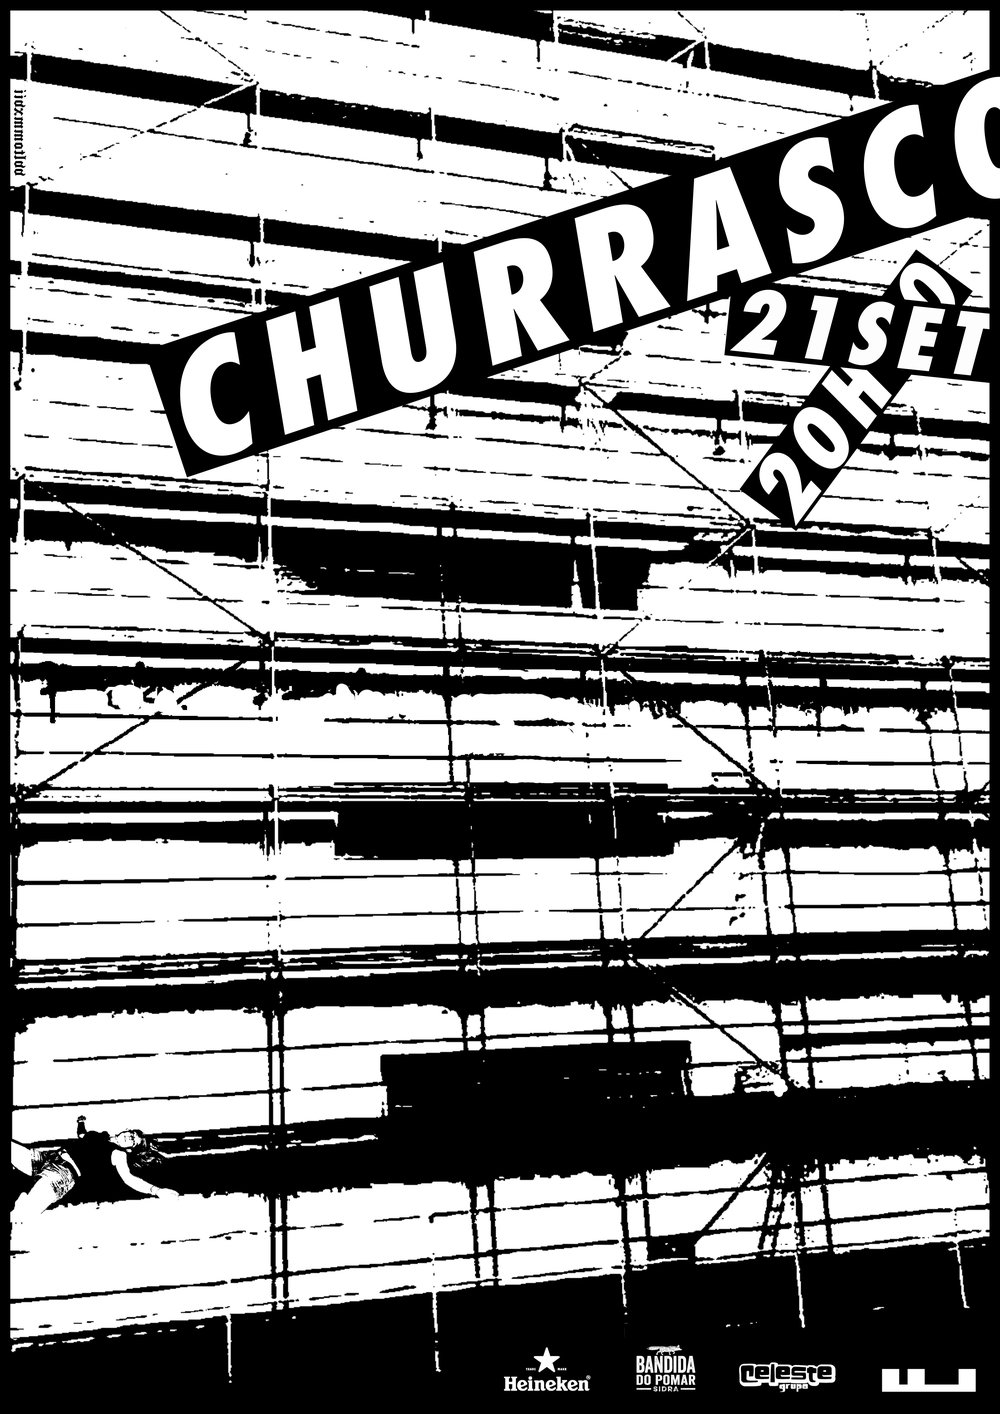 CHURRASCO.jpg